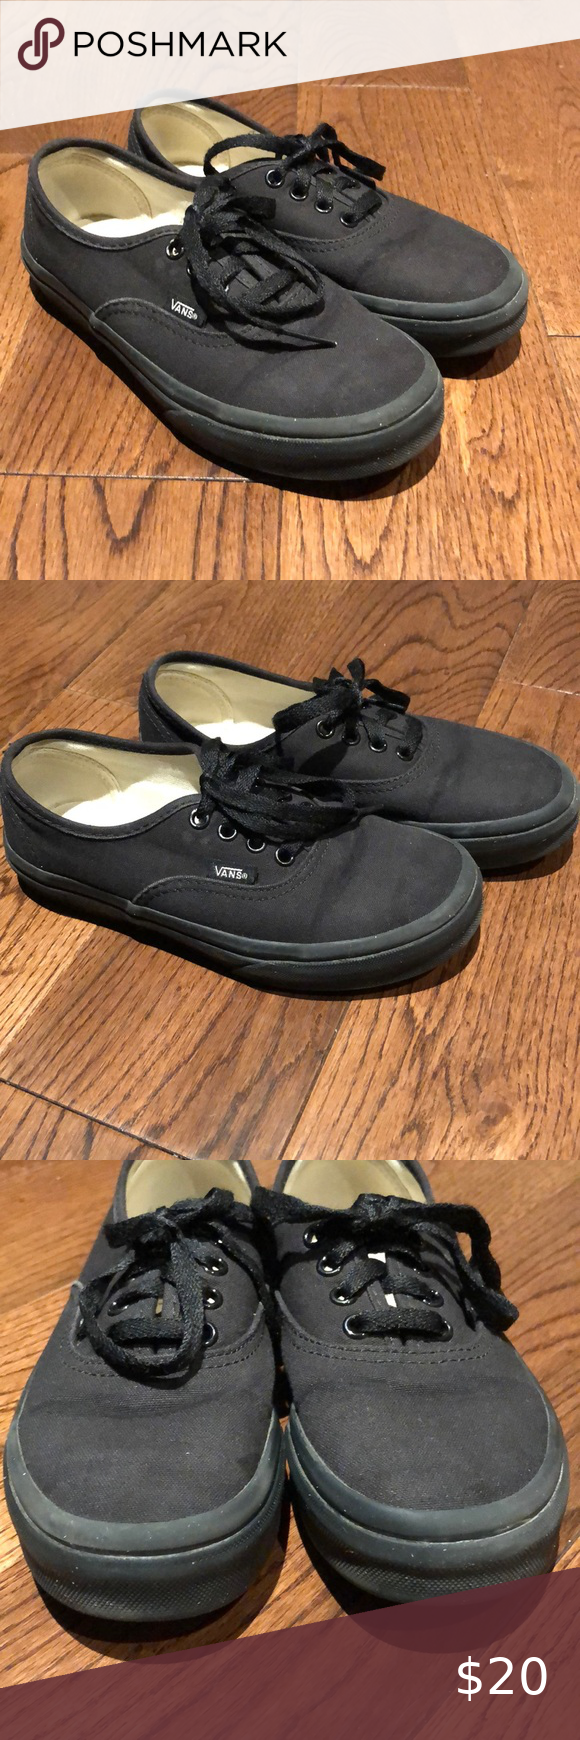 Vans Doheny Kids' Skate Shoes all black